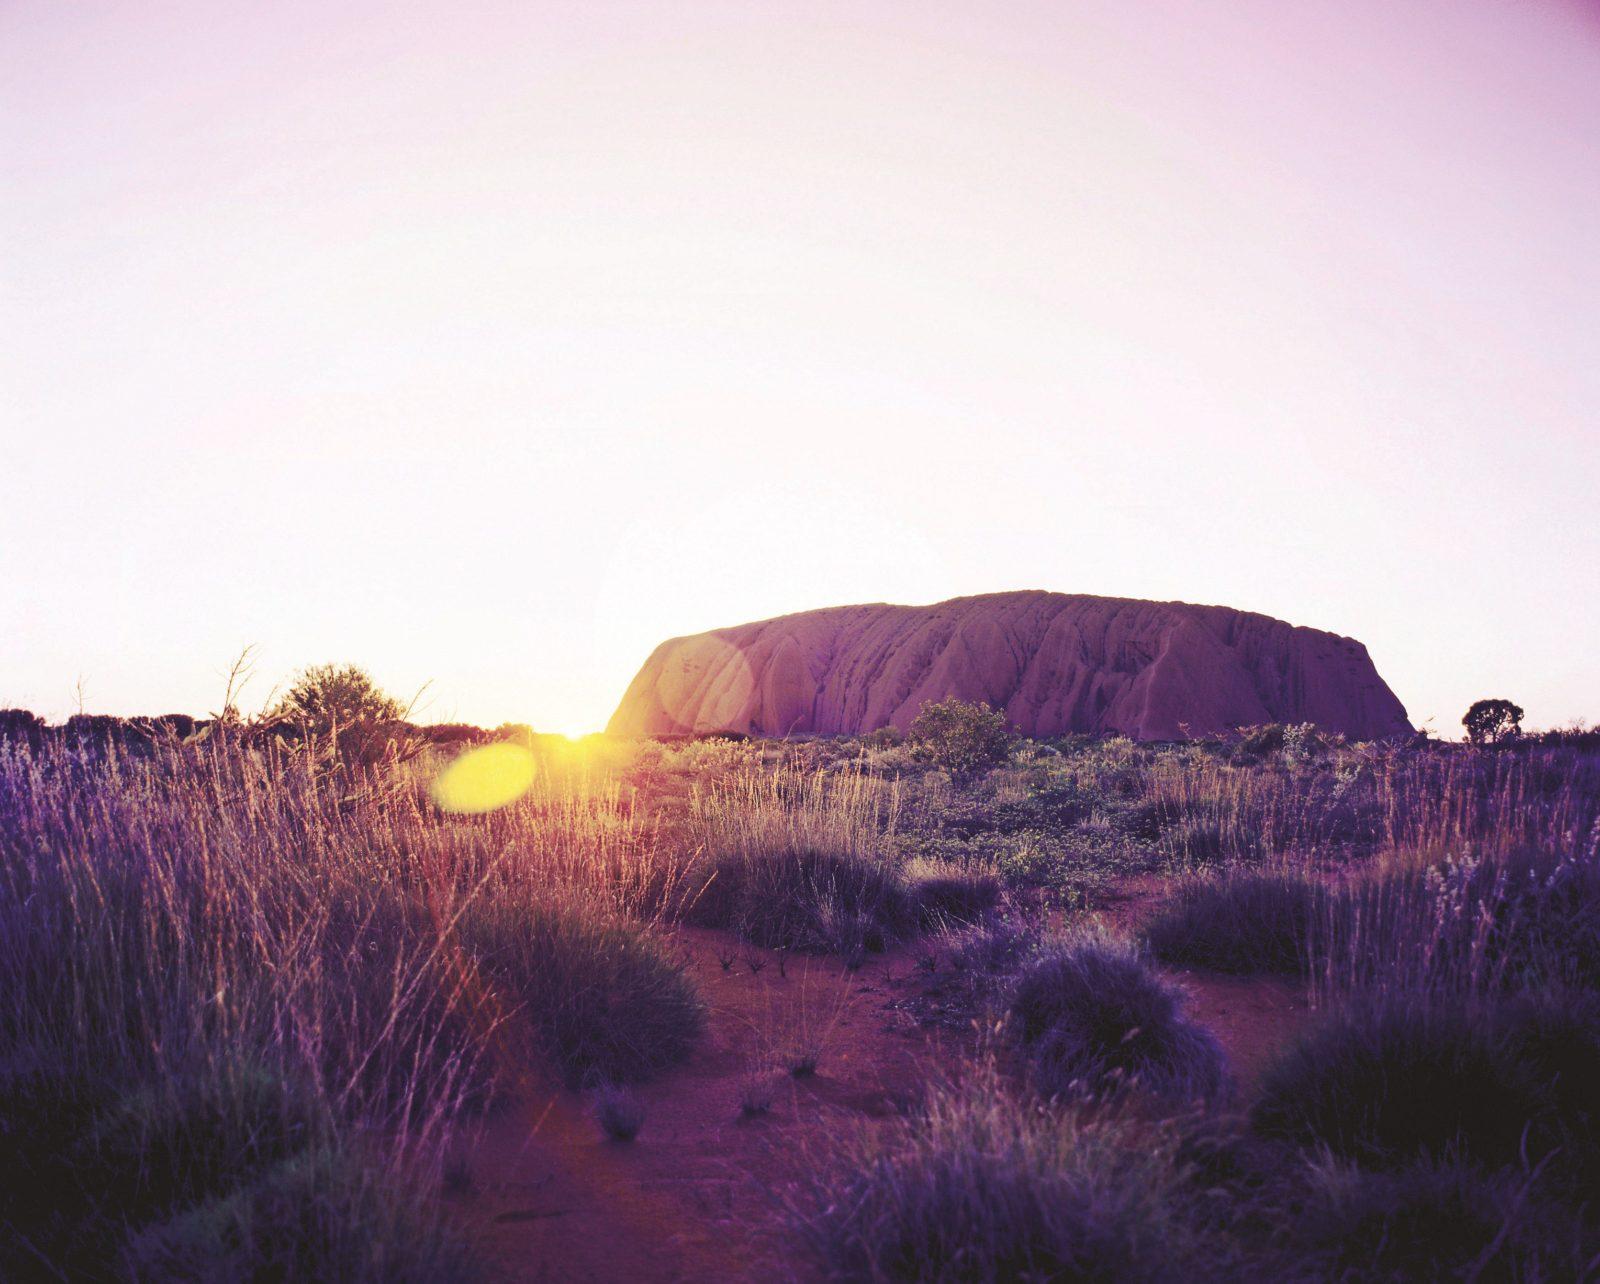 Uluru-Kata Tjuta National Park - Northern Territory, Australia